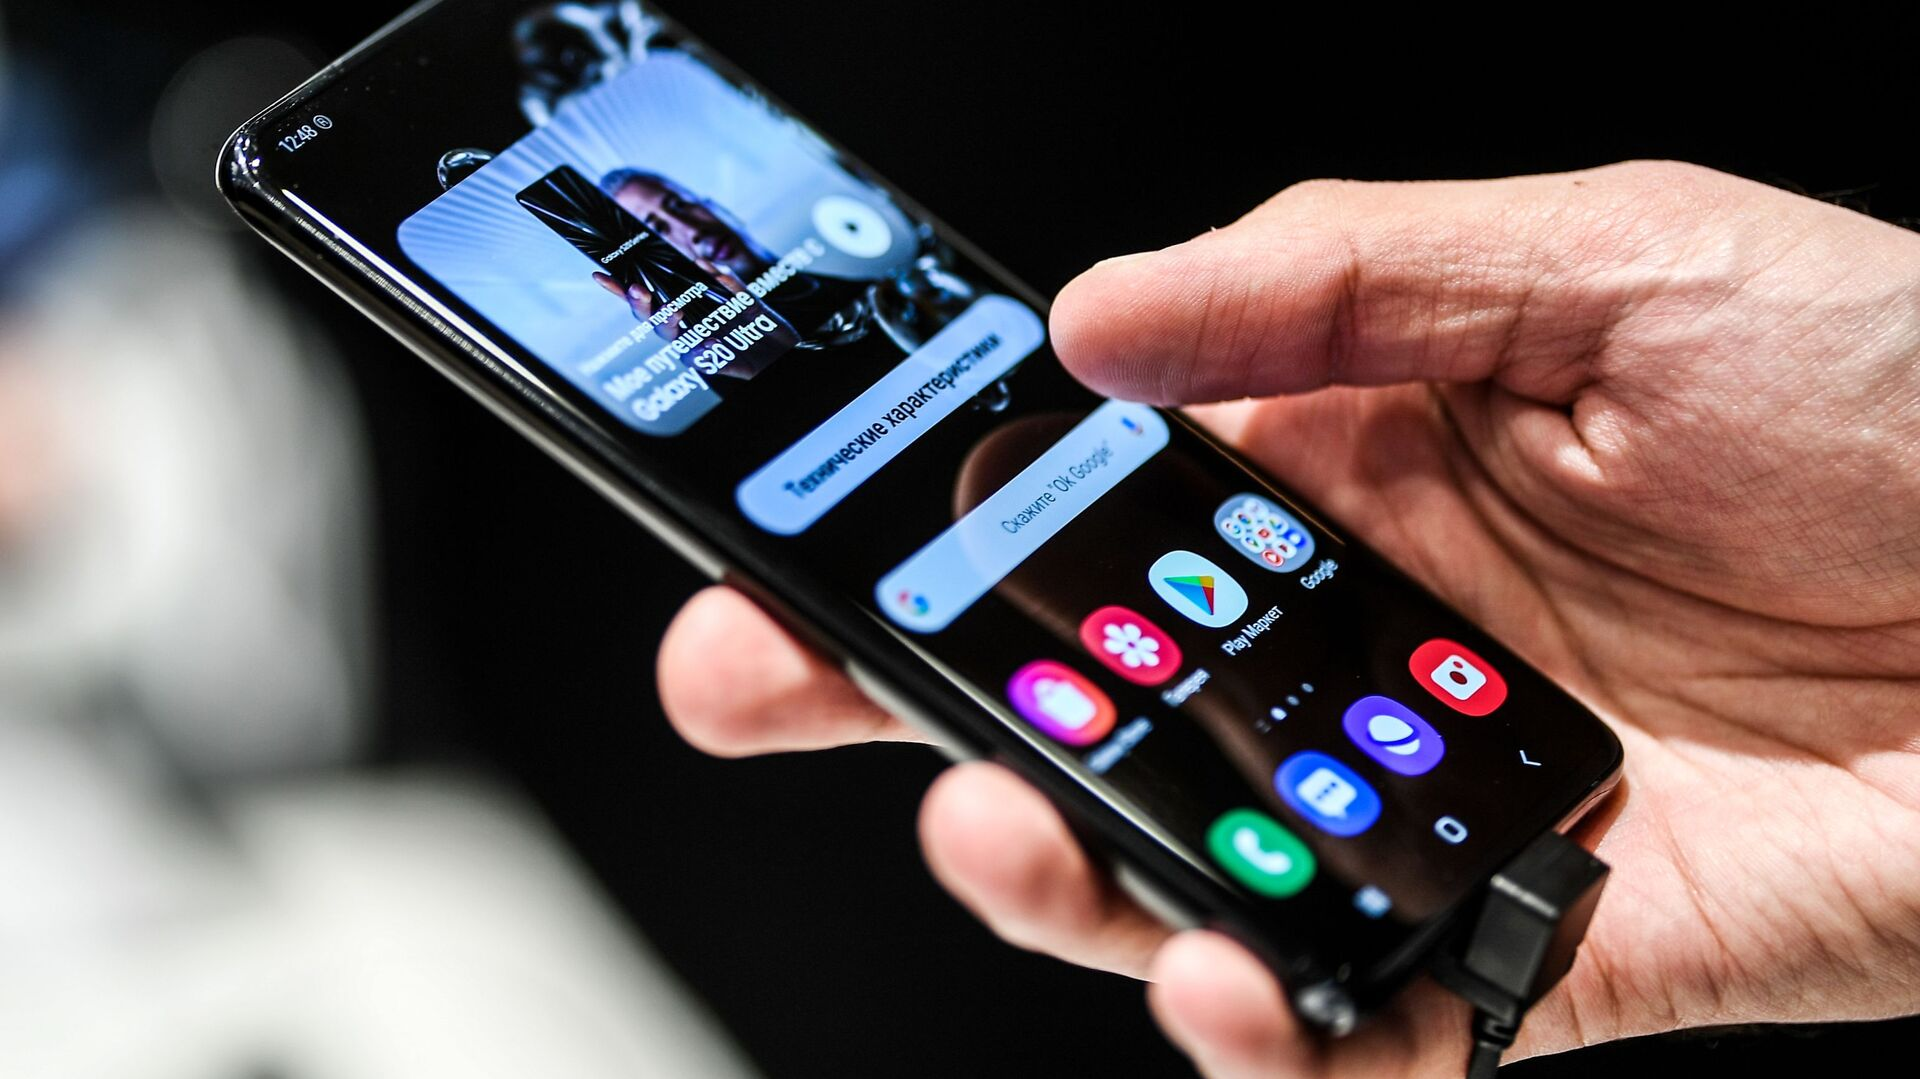 Smartphone, Samsung Galaxy - Sputnik Italia, 1920, 28.09.2021